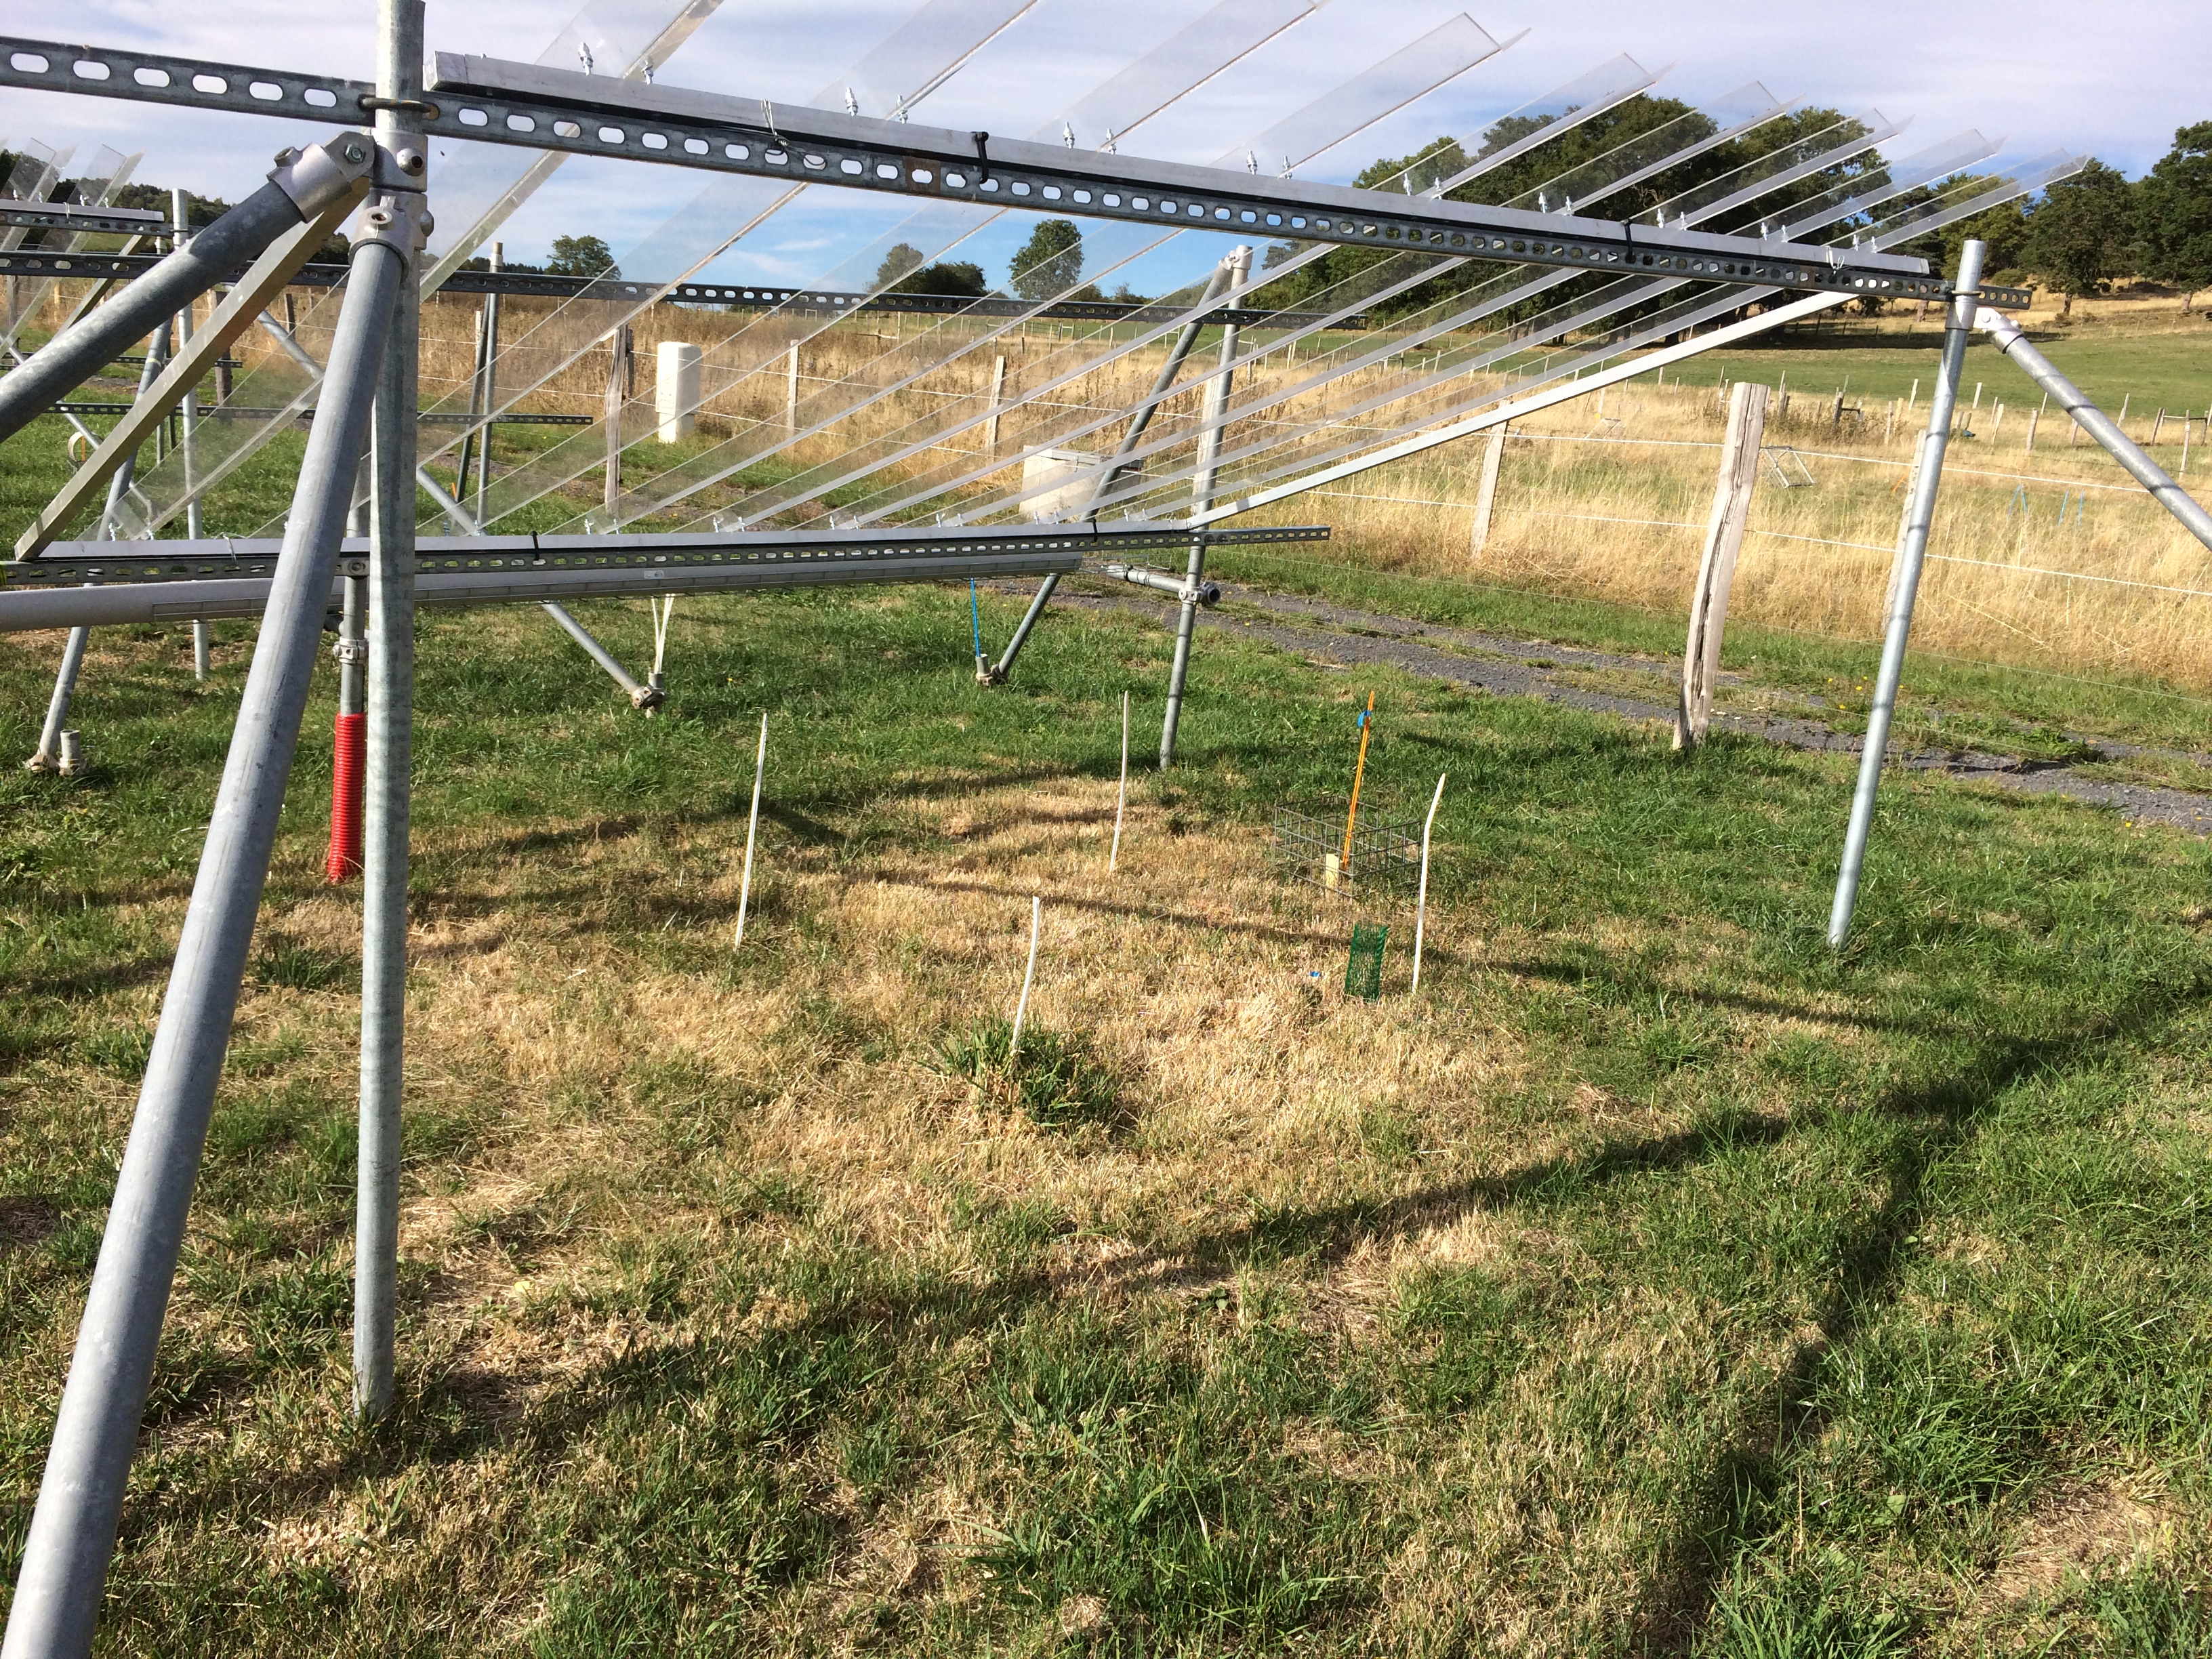 Dispositif expérimental Theix prairies et sécheresse